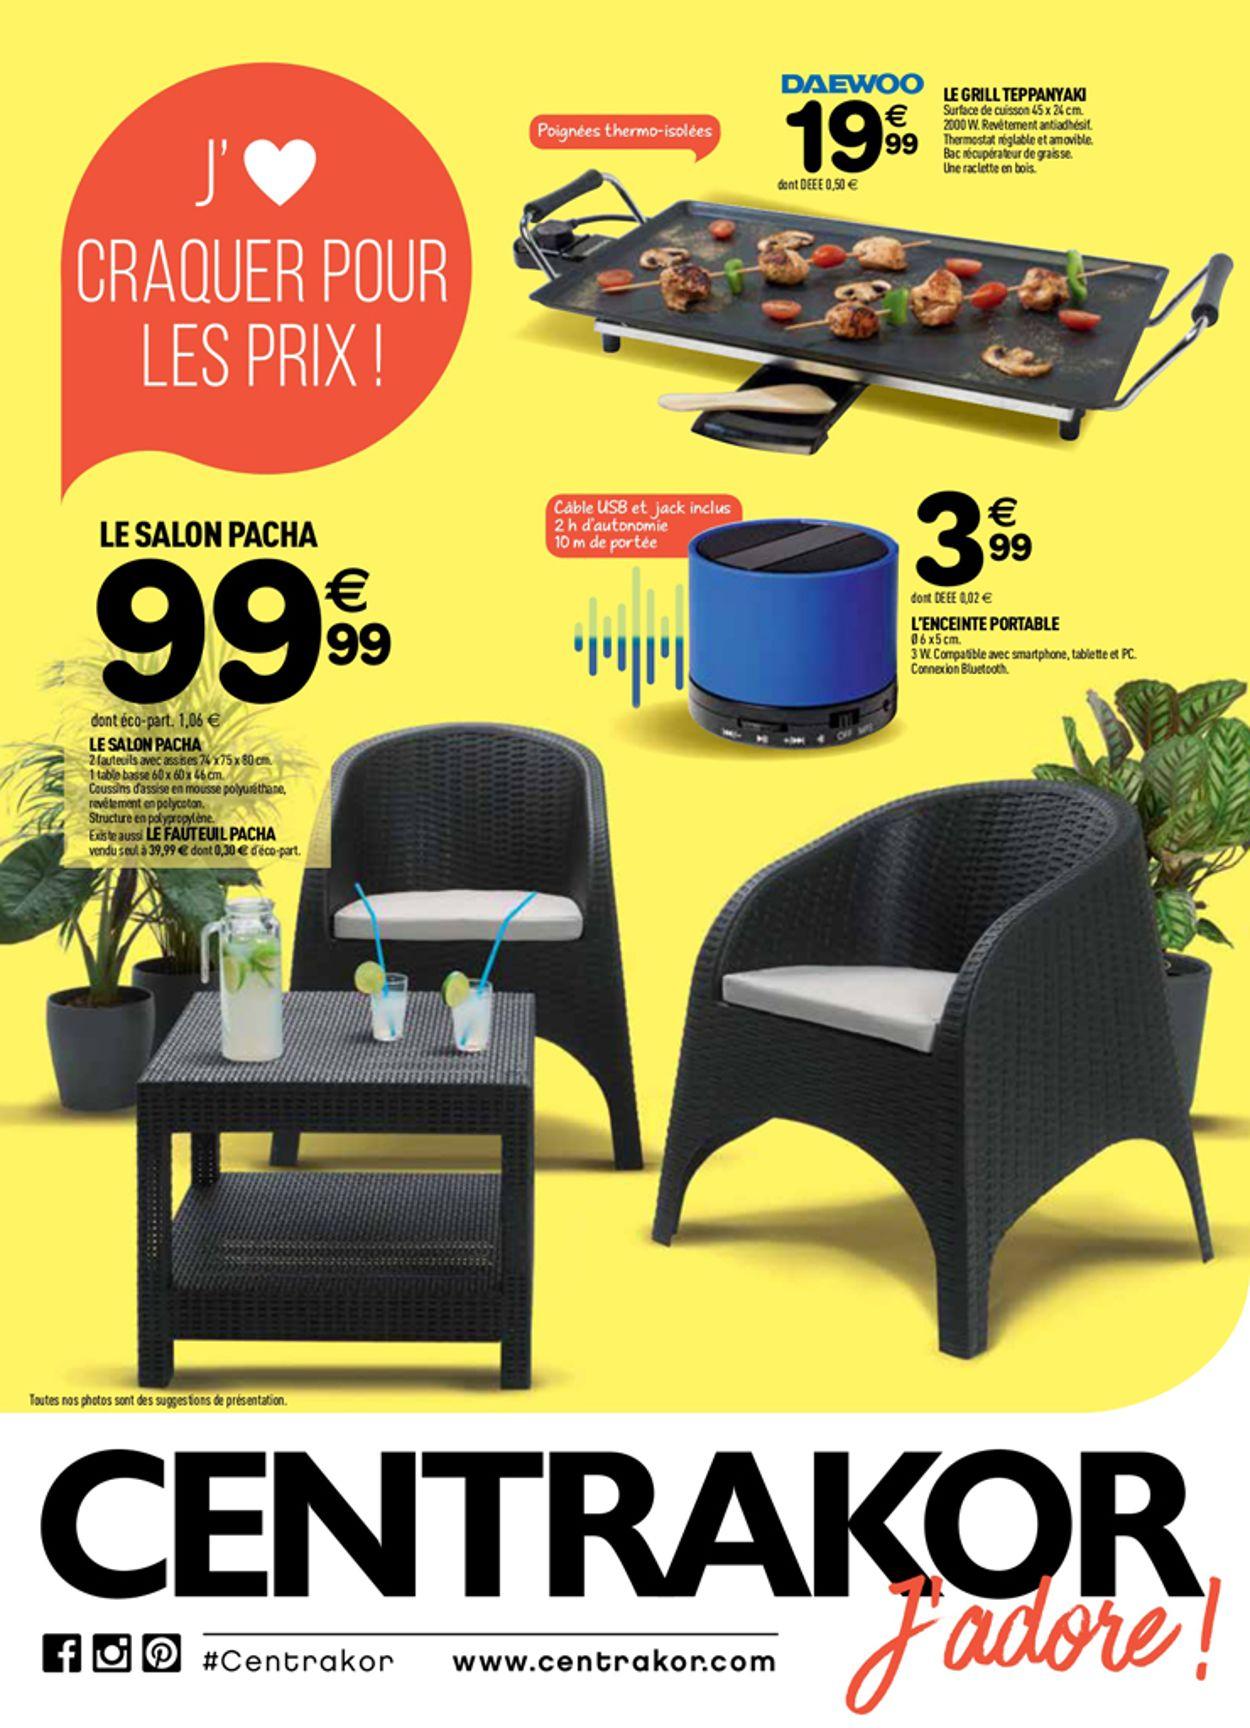 Centrakor Catalogue Actuel 01.07 - 14.07.2019 - Catalogue-24 encequiconcerne Centrakor Salon De Jardin